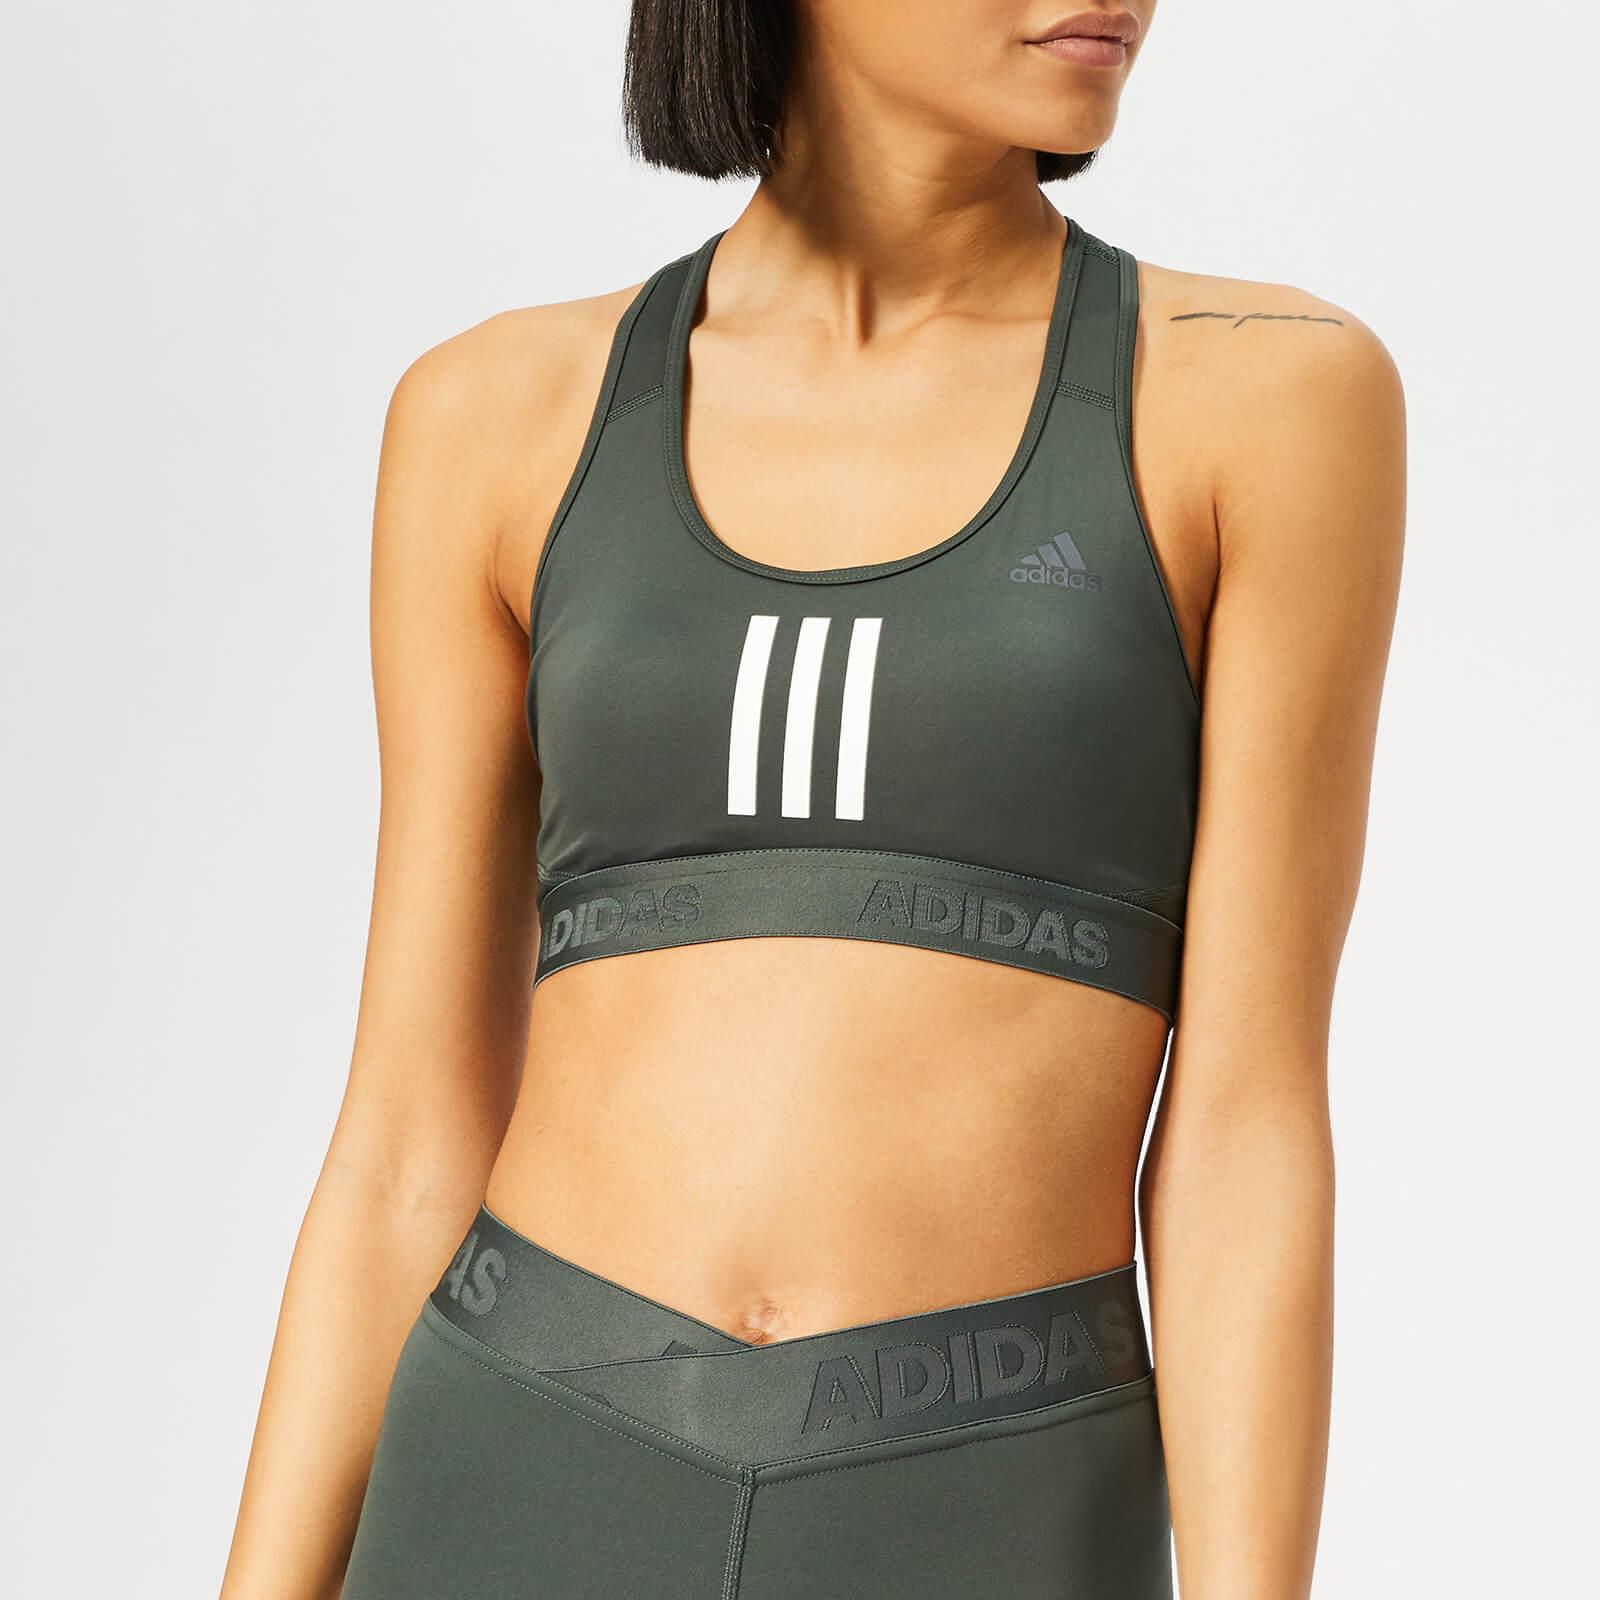 adidas Women's Don't Rest 3 Stripes Bra - Legend Ivy - XS - Green